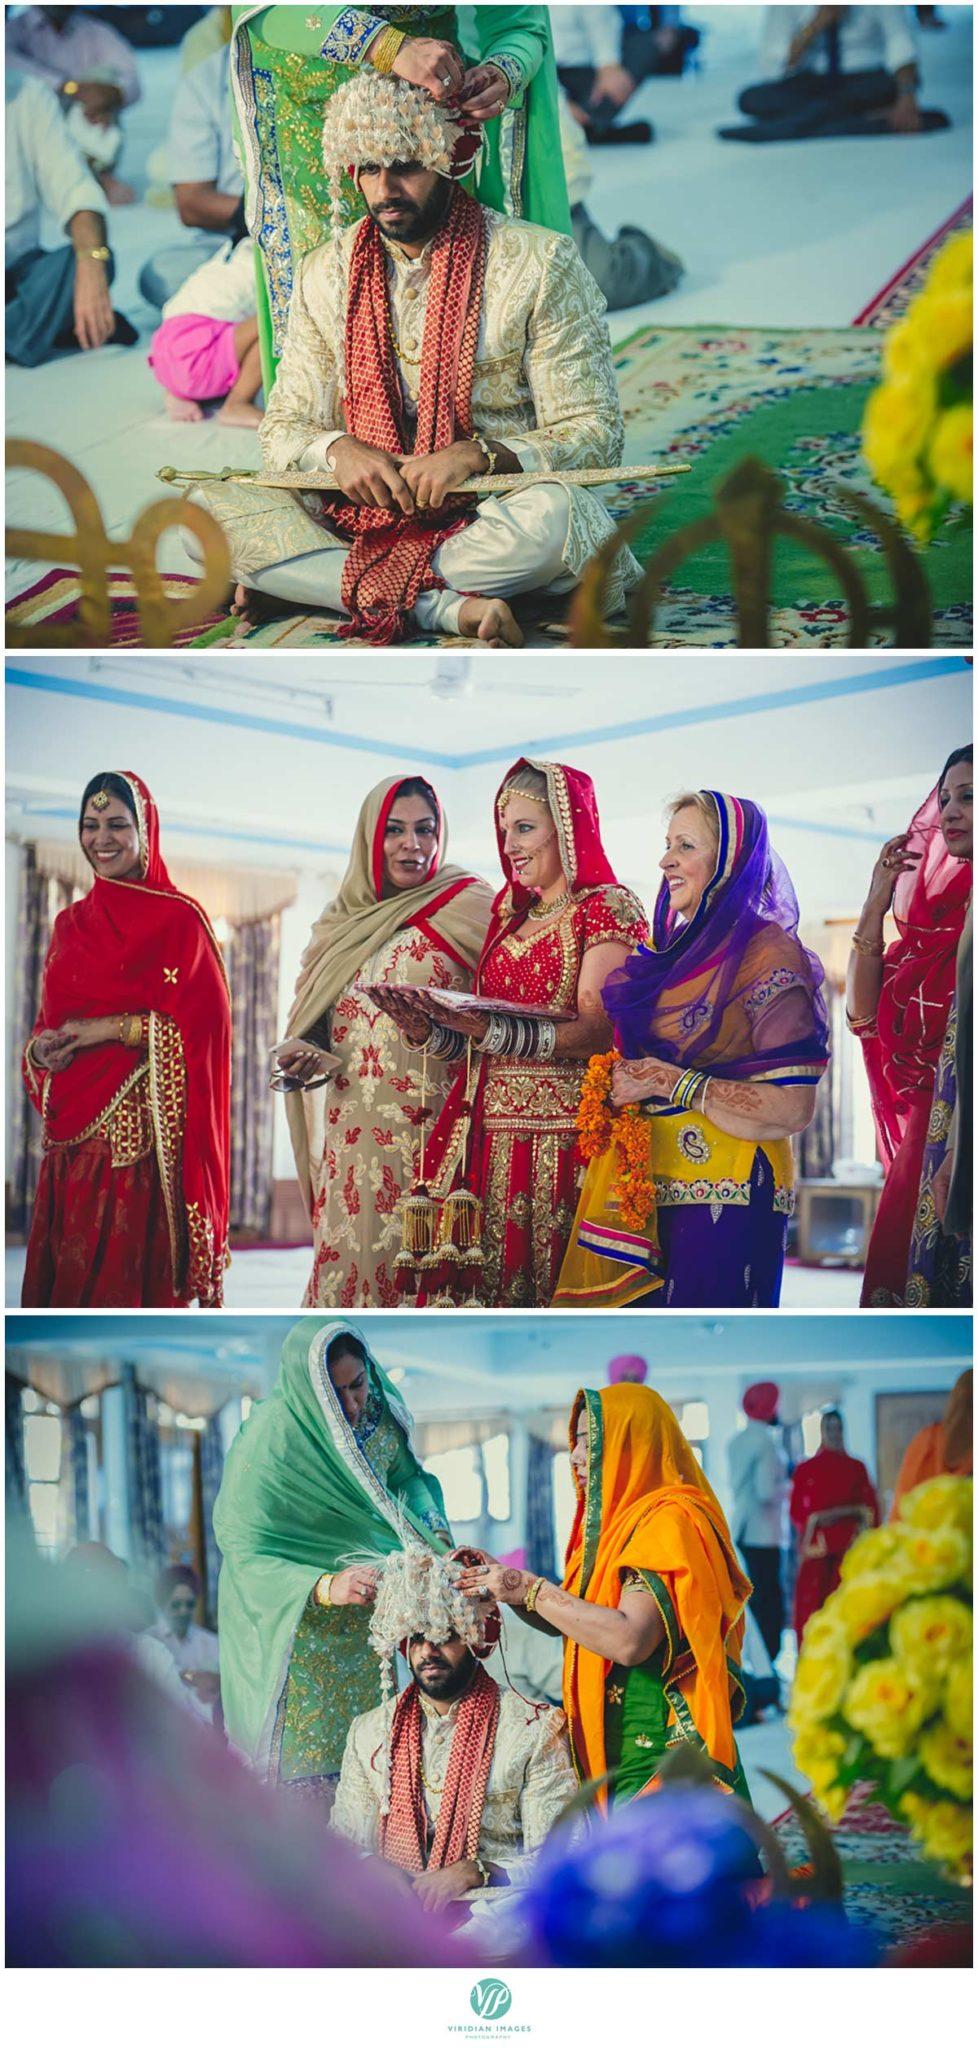 India_Chandigarh_Wedding_Viridian_Images_Photography_poto_19